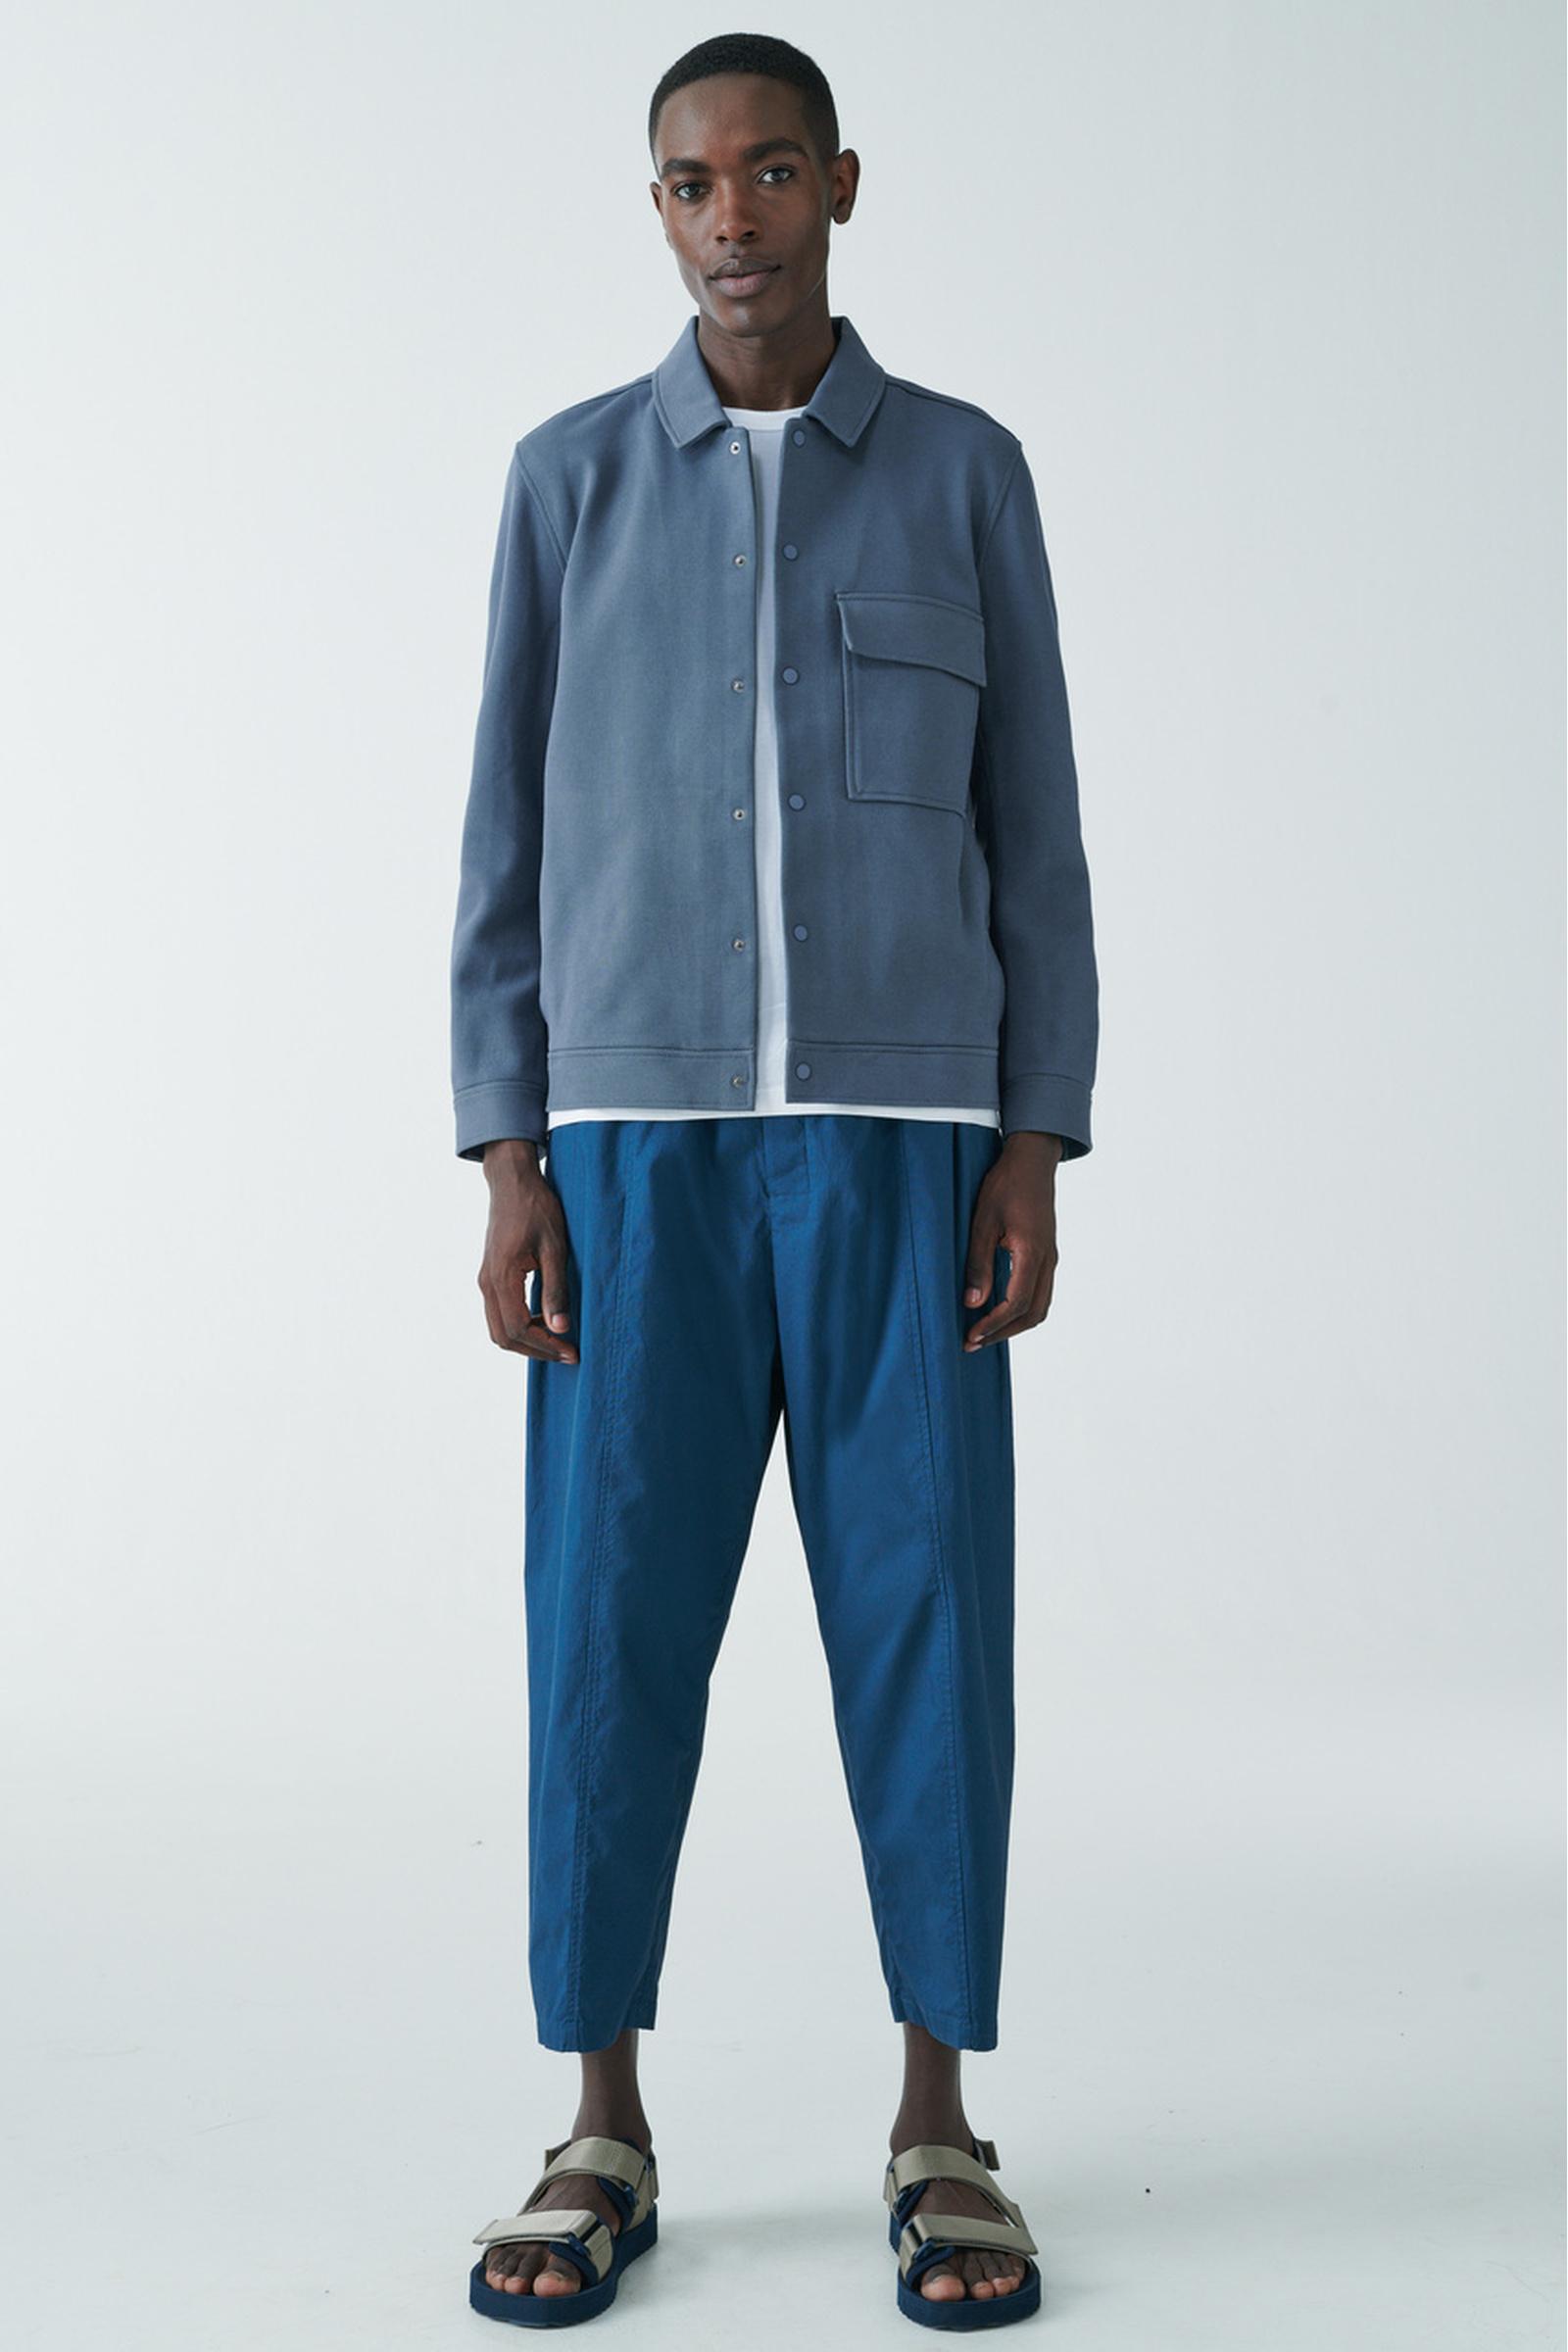 COS 코튼 트윌 셔츠 재킷의 라이트 블루컬러 ECOMLook입니다.